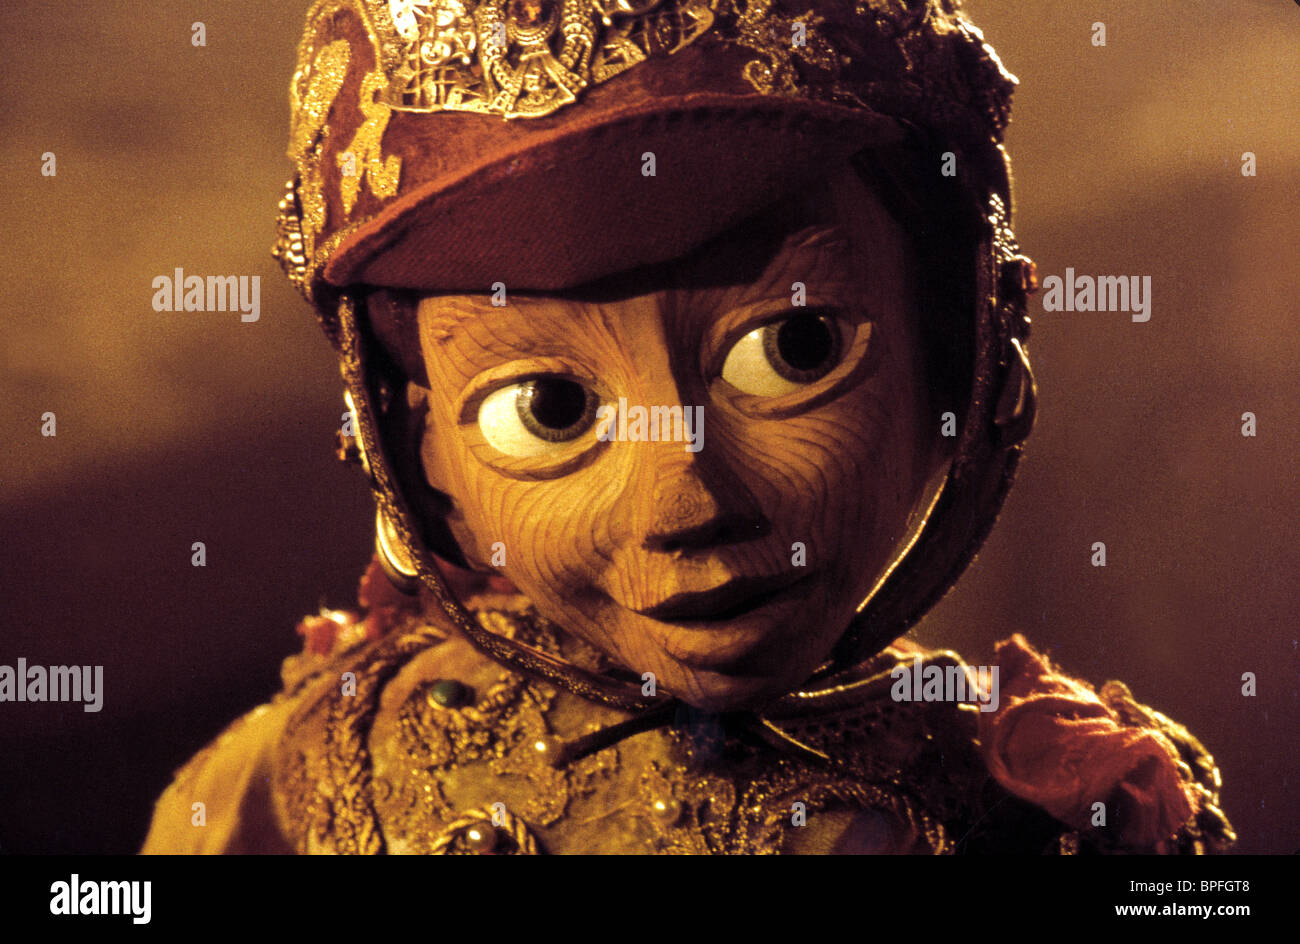 PINOCCHIO LES AVENTURES DE Pinocchio (1996) Photo Stock